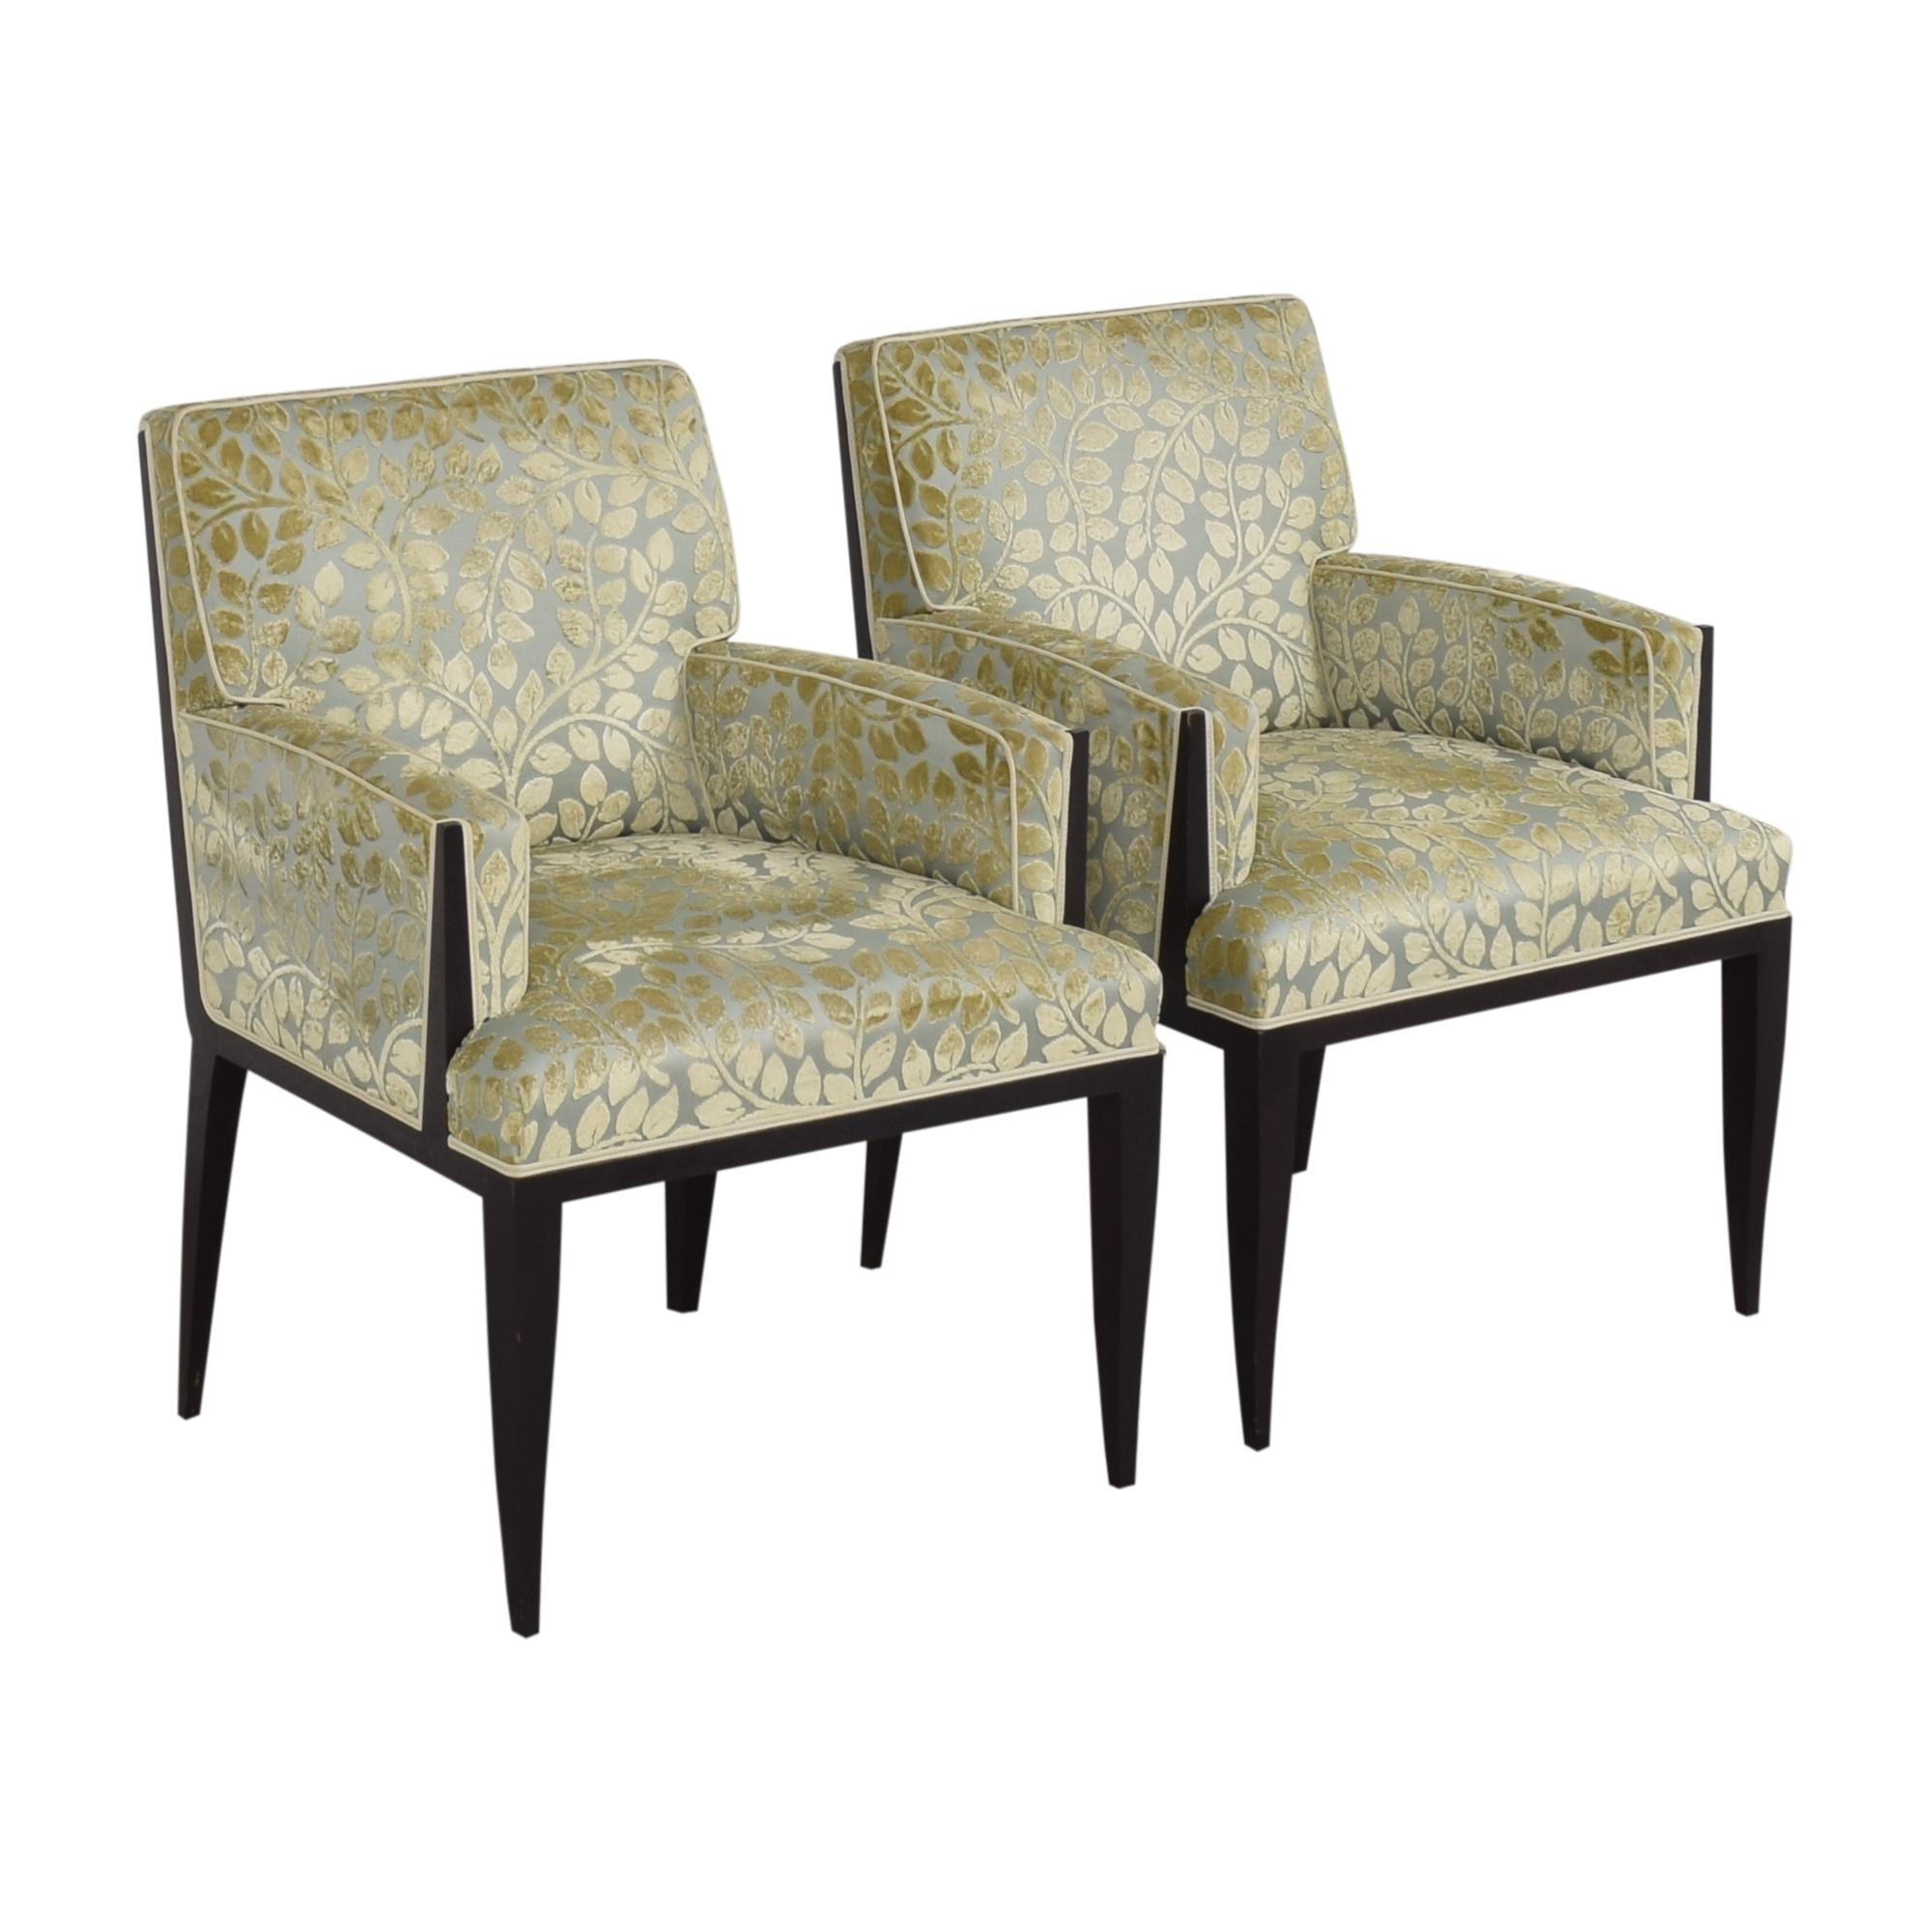 Mattaliano Mattaliano Flea Market #1 Dining Arm Chairs Dining Chairs